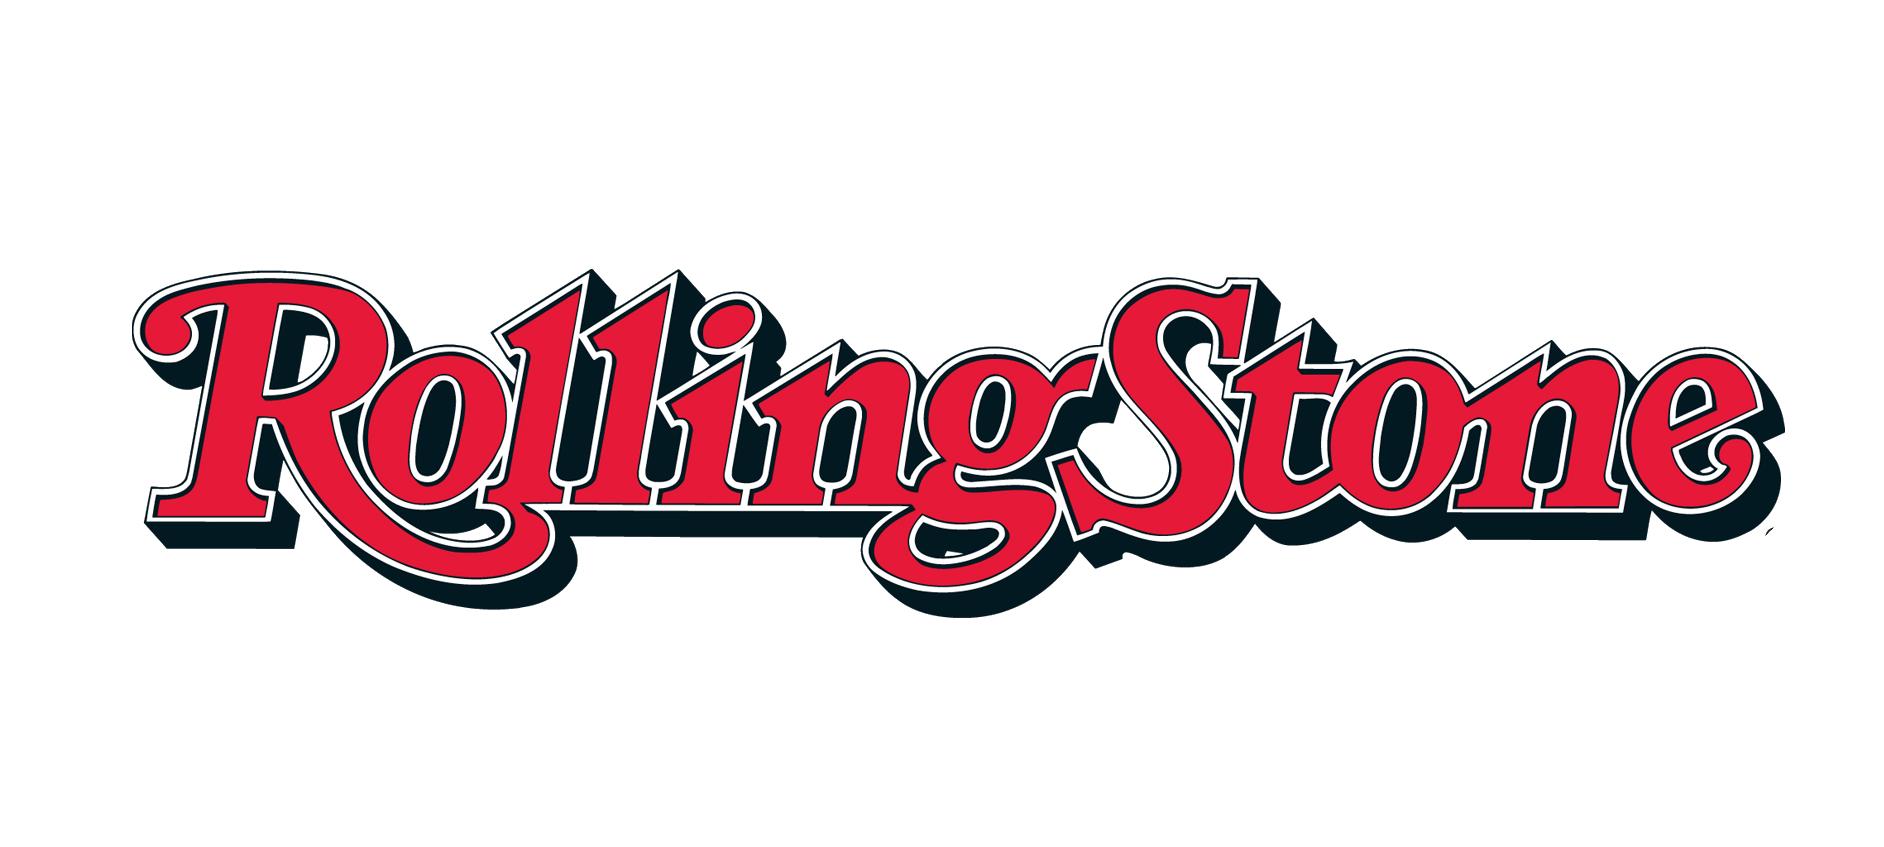 red-emblem-rolling-stones-png-logo-30.png